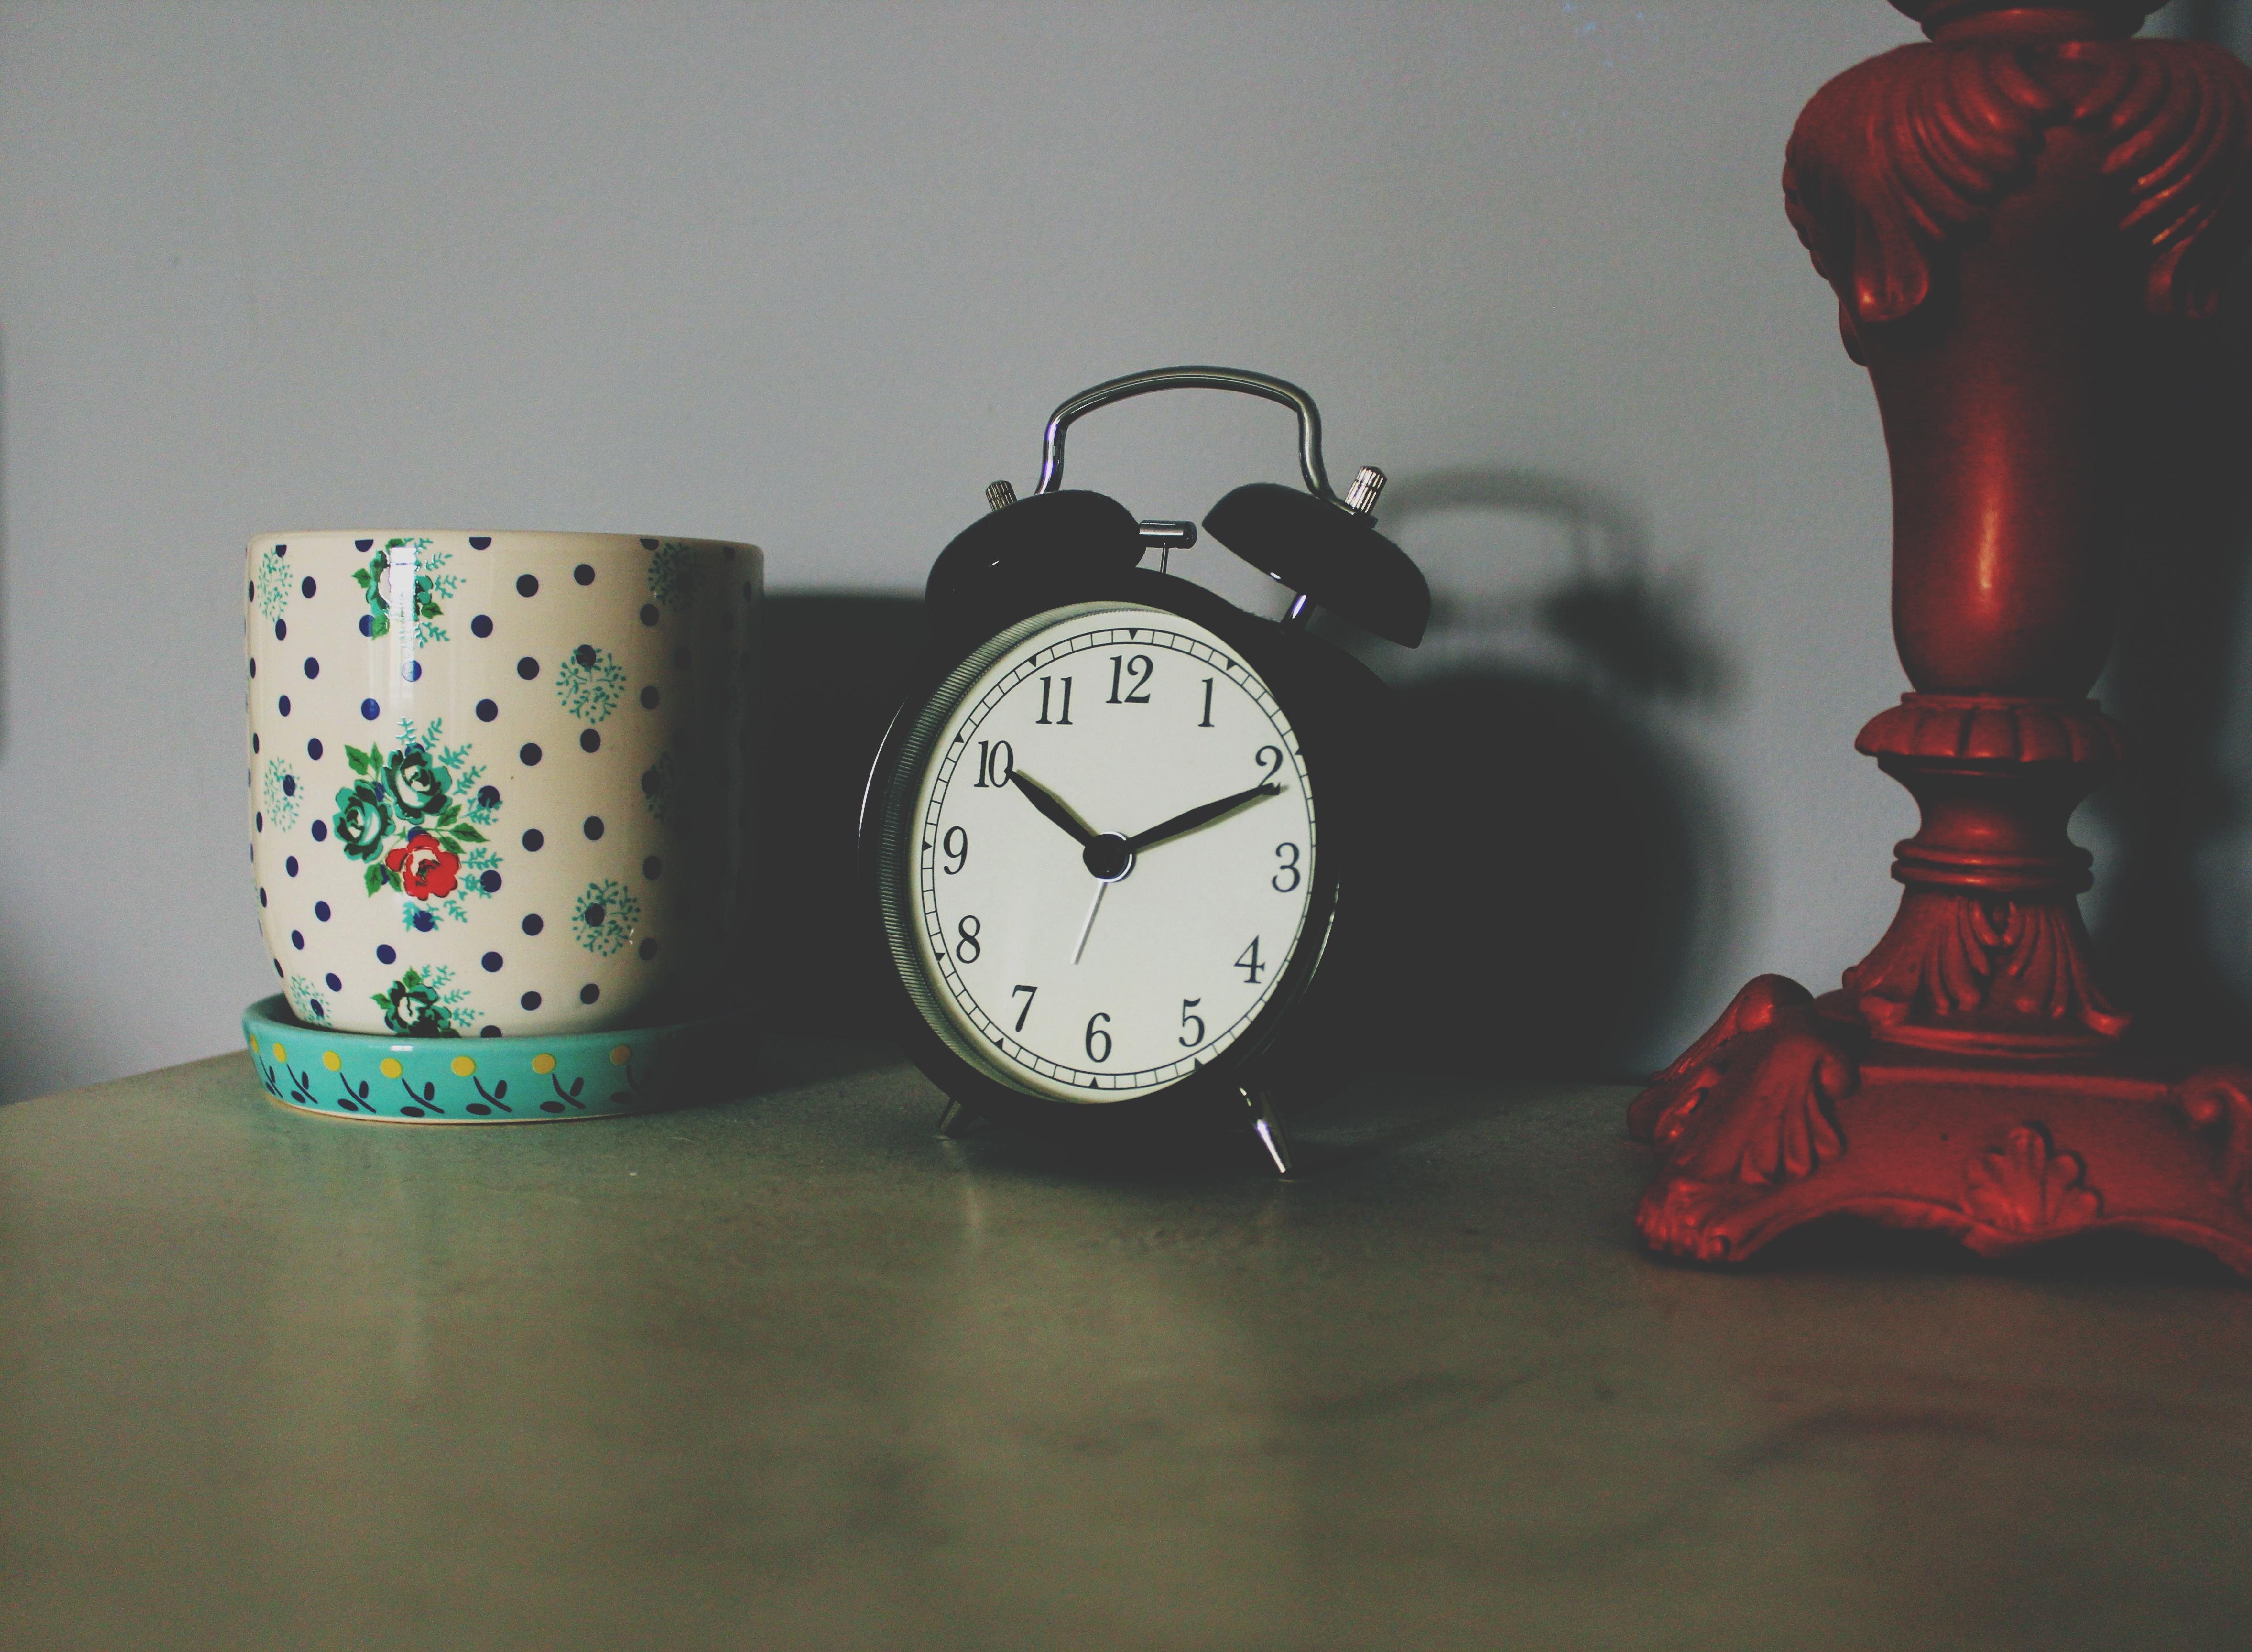 In de ochtend weinig motivatie om te lopen? 5 tips